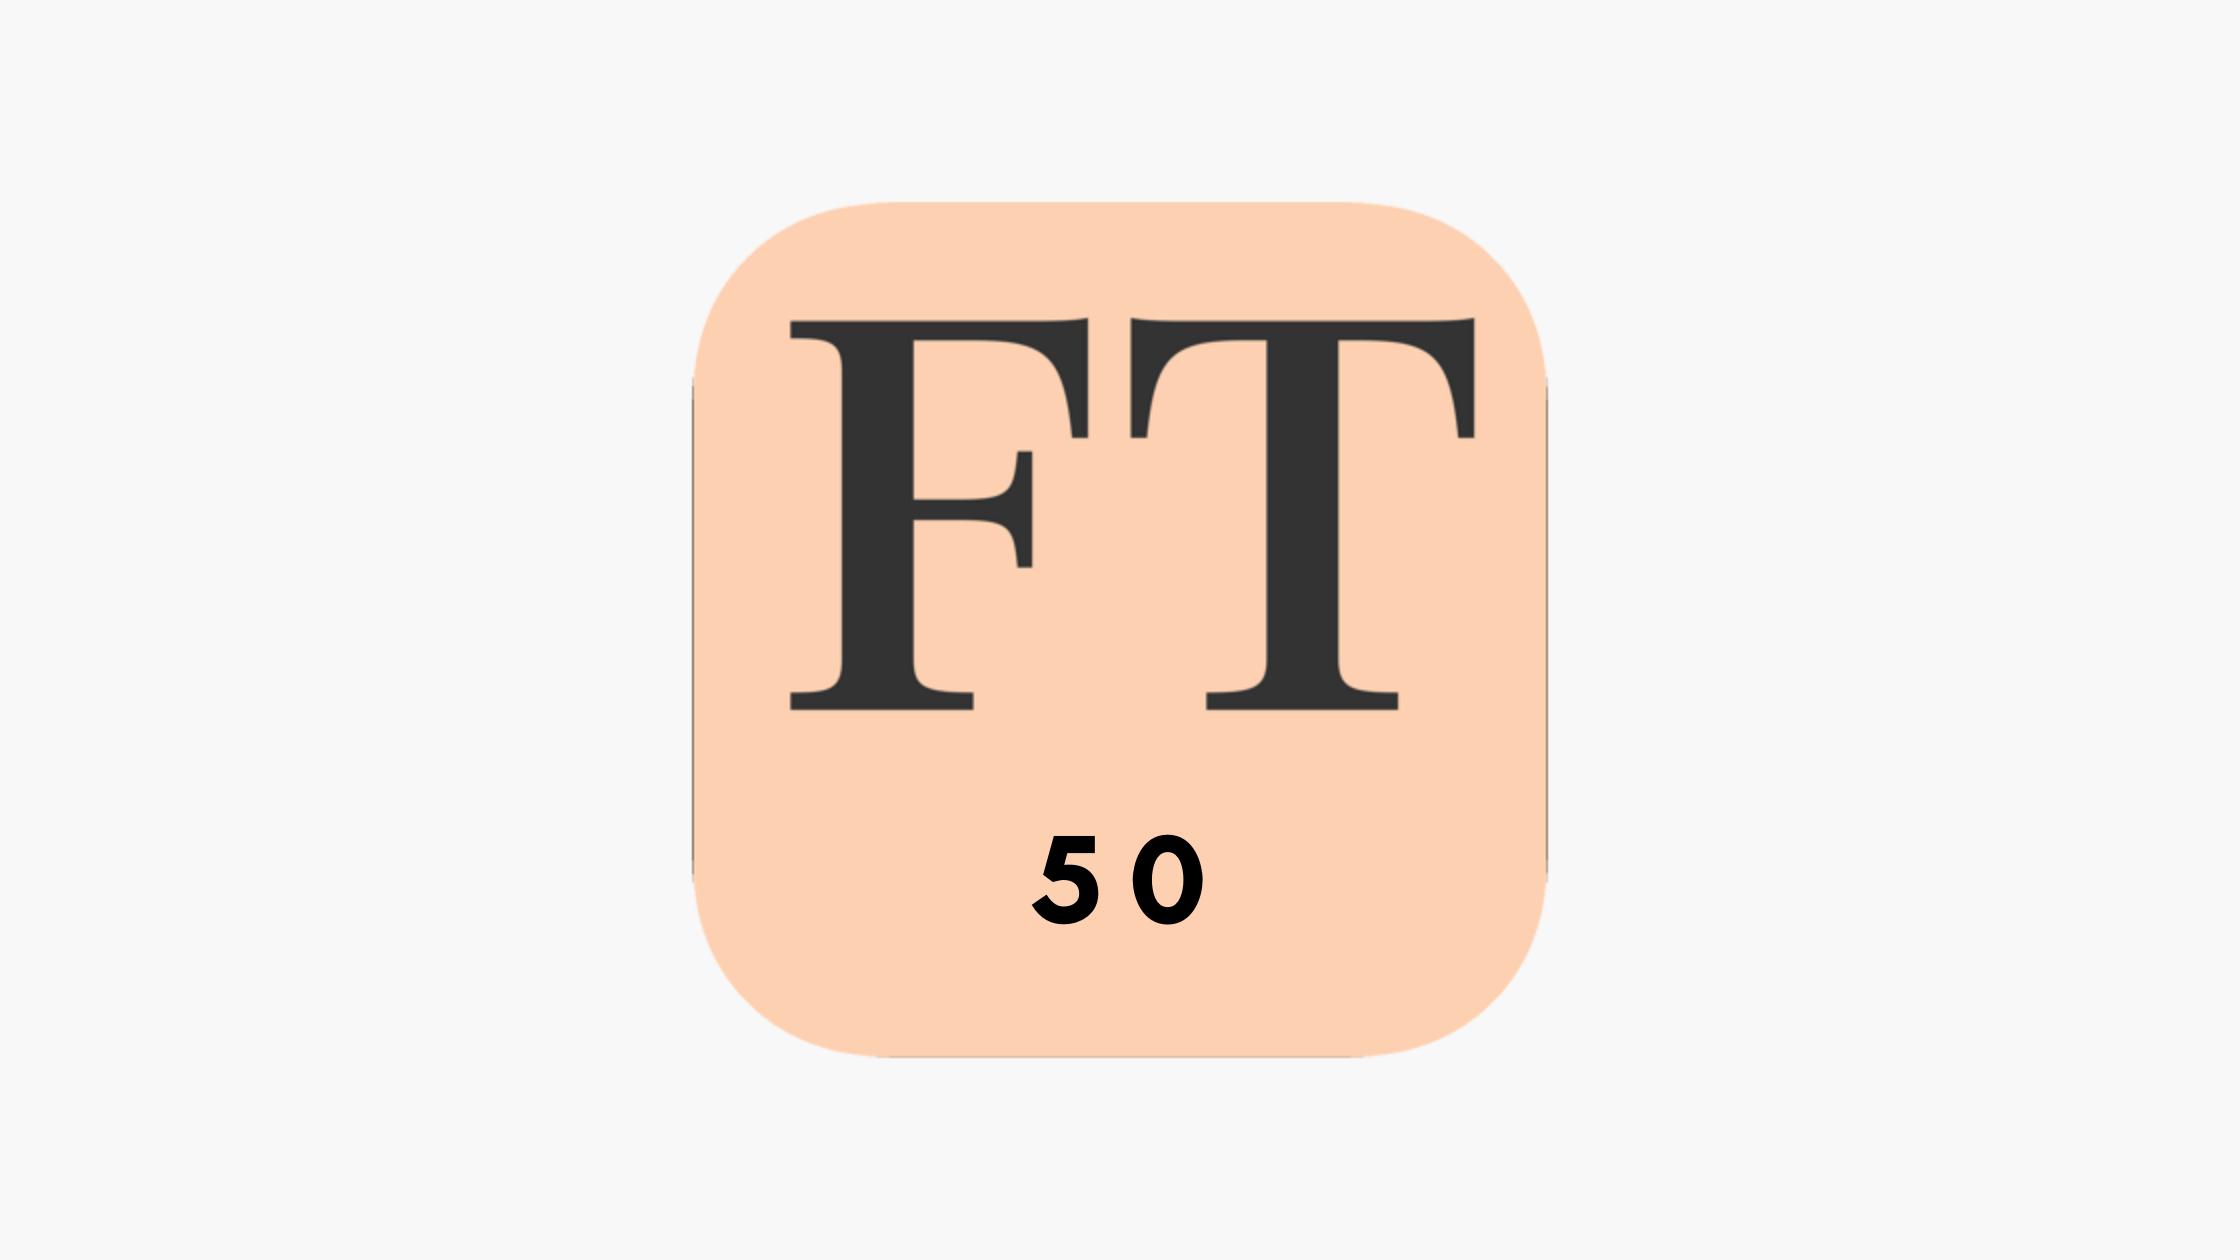 FT-50 Journals List | Top Journals in management